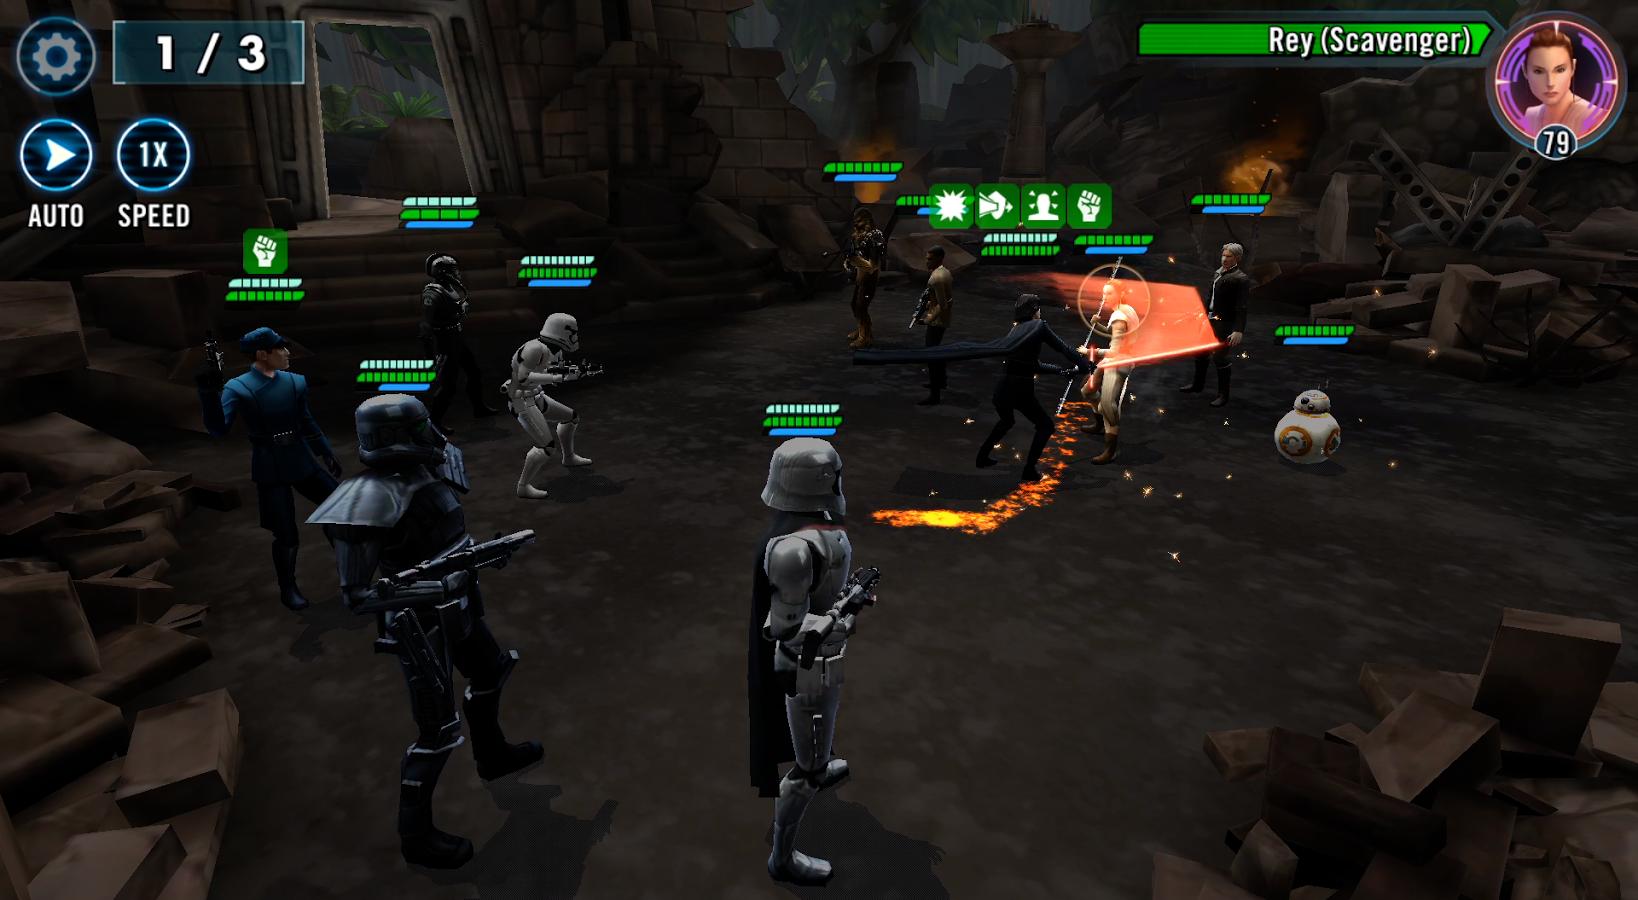 Star Wars Galaxy of Heroes on PC - Gameplay Screenshot